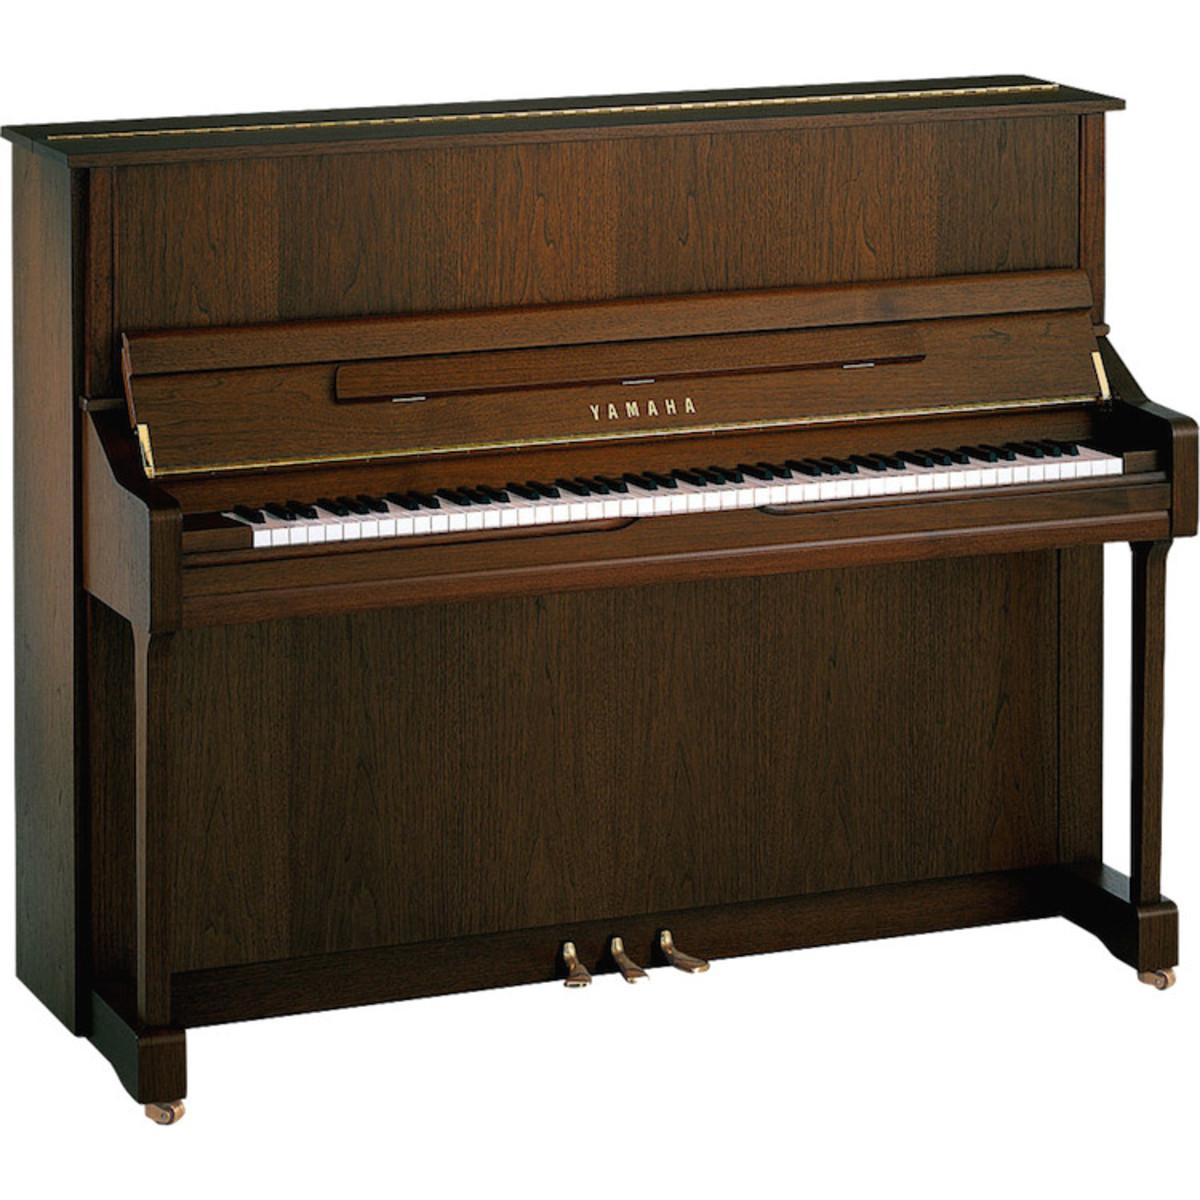 Yamaha b3 upright acoustic piano dark walnut satin at for Yamaha acoustic pianos